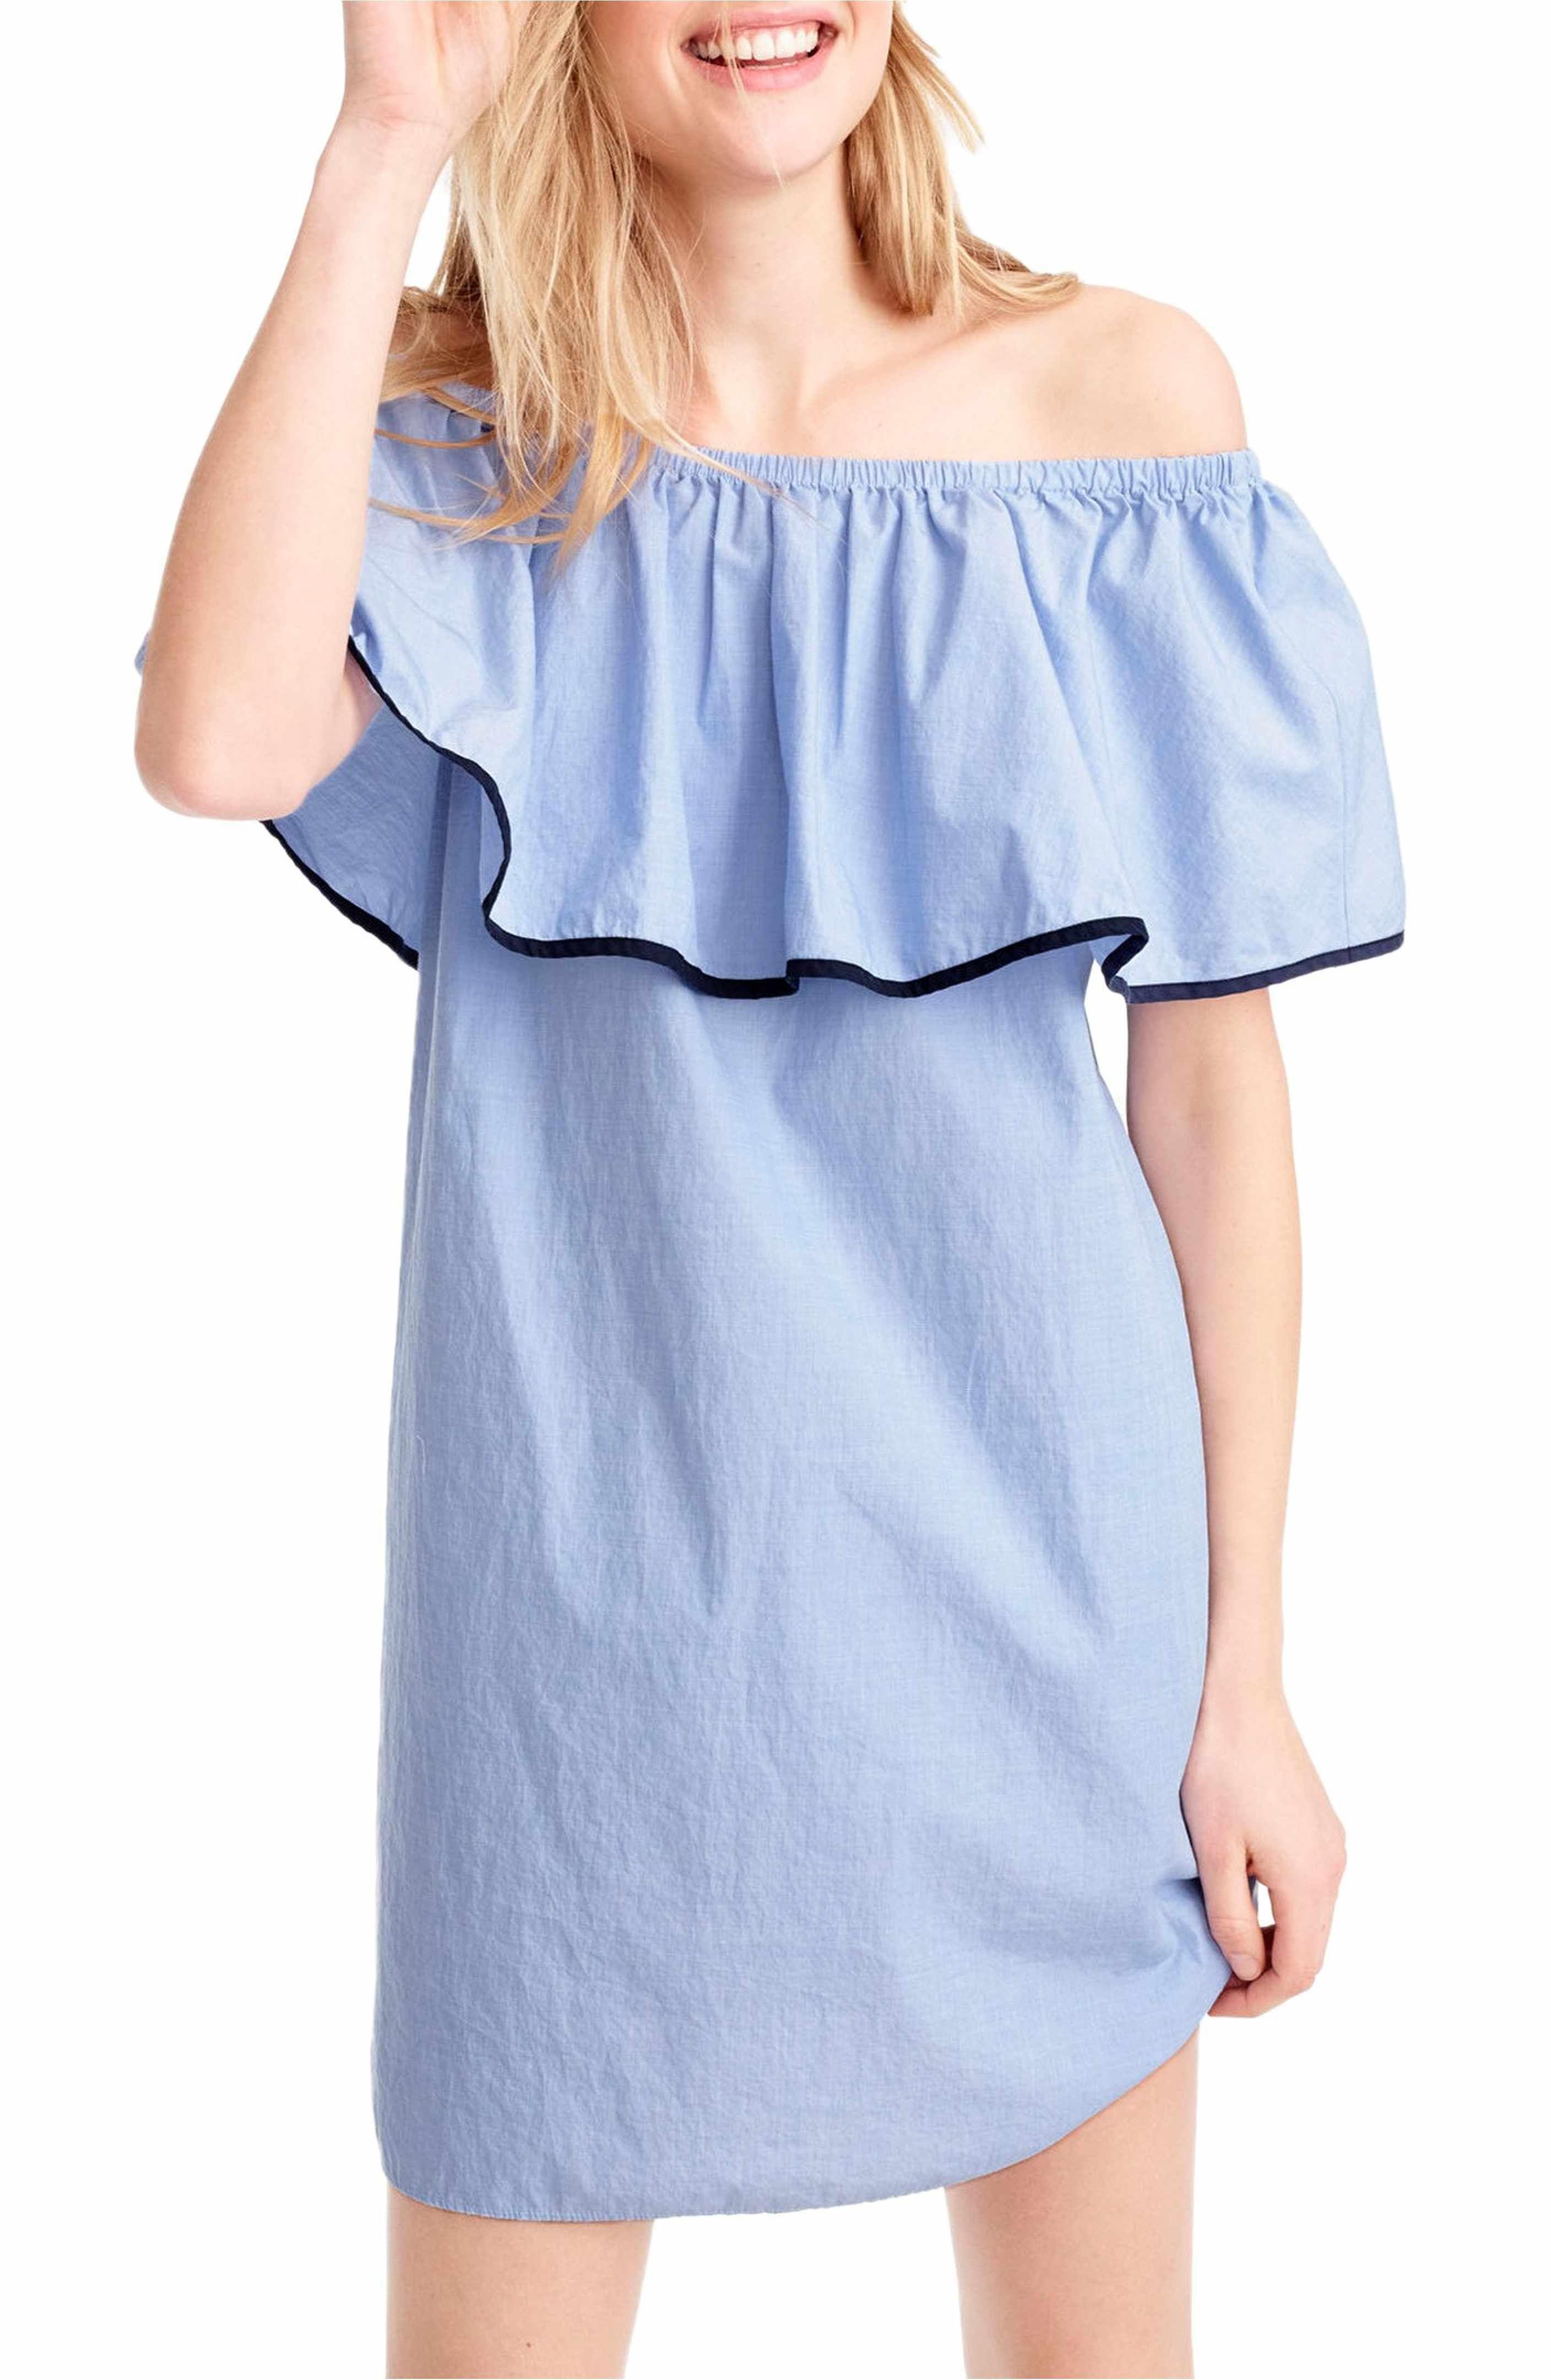 Jcrew tipped off the shoulder shift dress hydrangea blue from